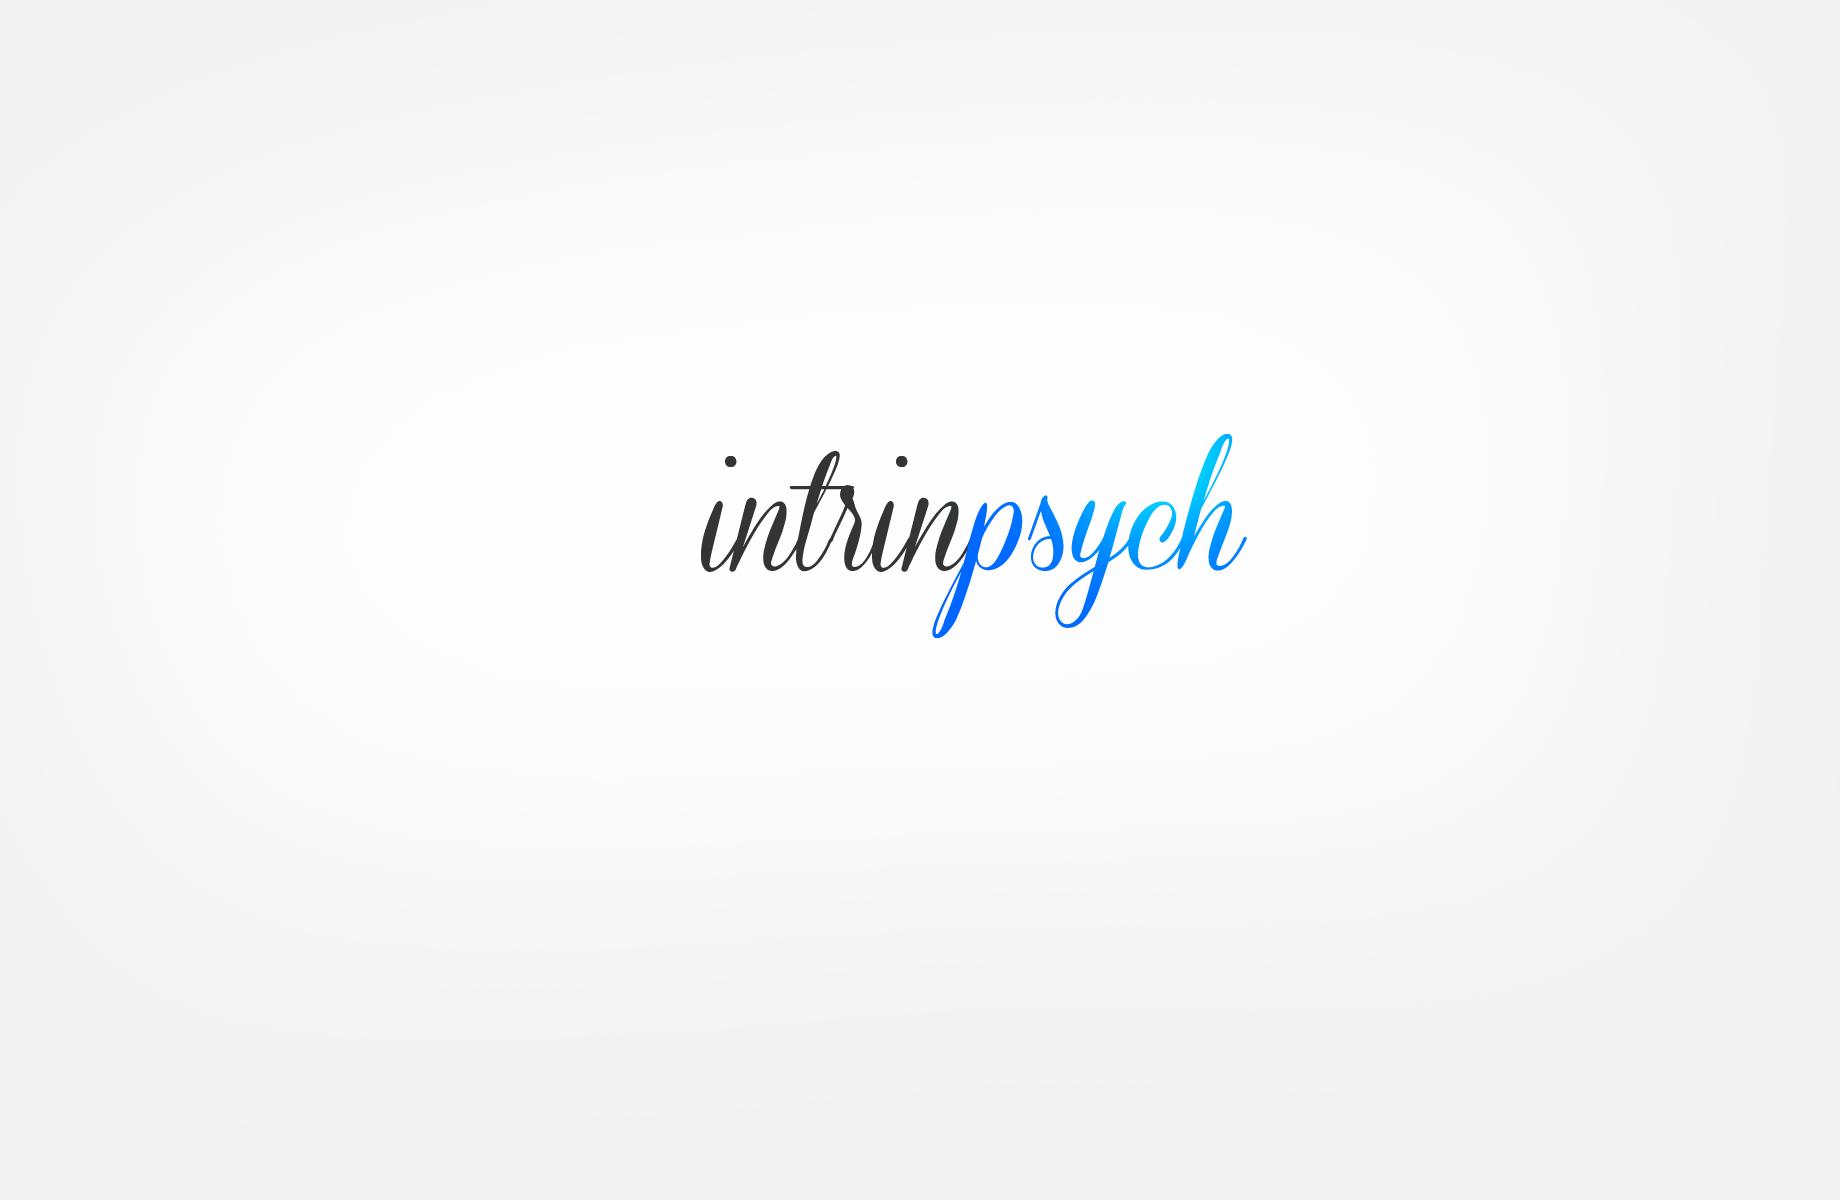 Logo Design by Jan Chua - Entry No. 56 in the Logo Design Contest New Logo Design for IntrinPsych.